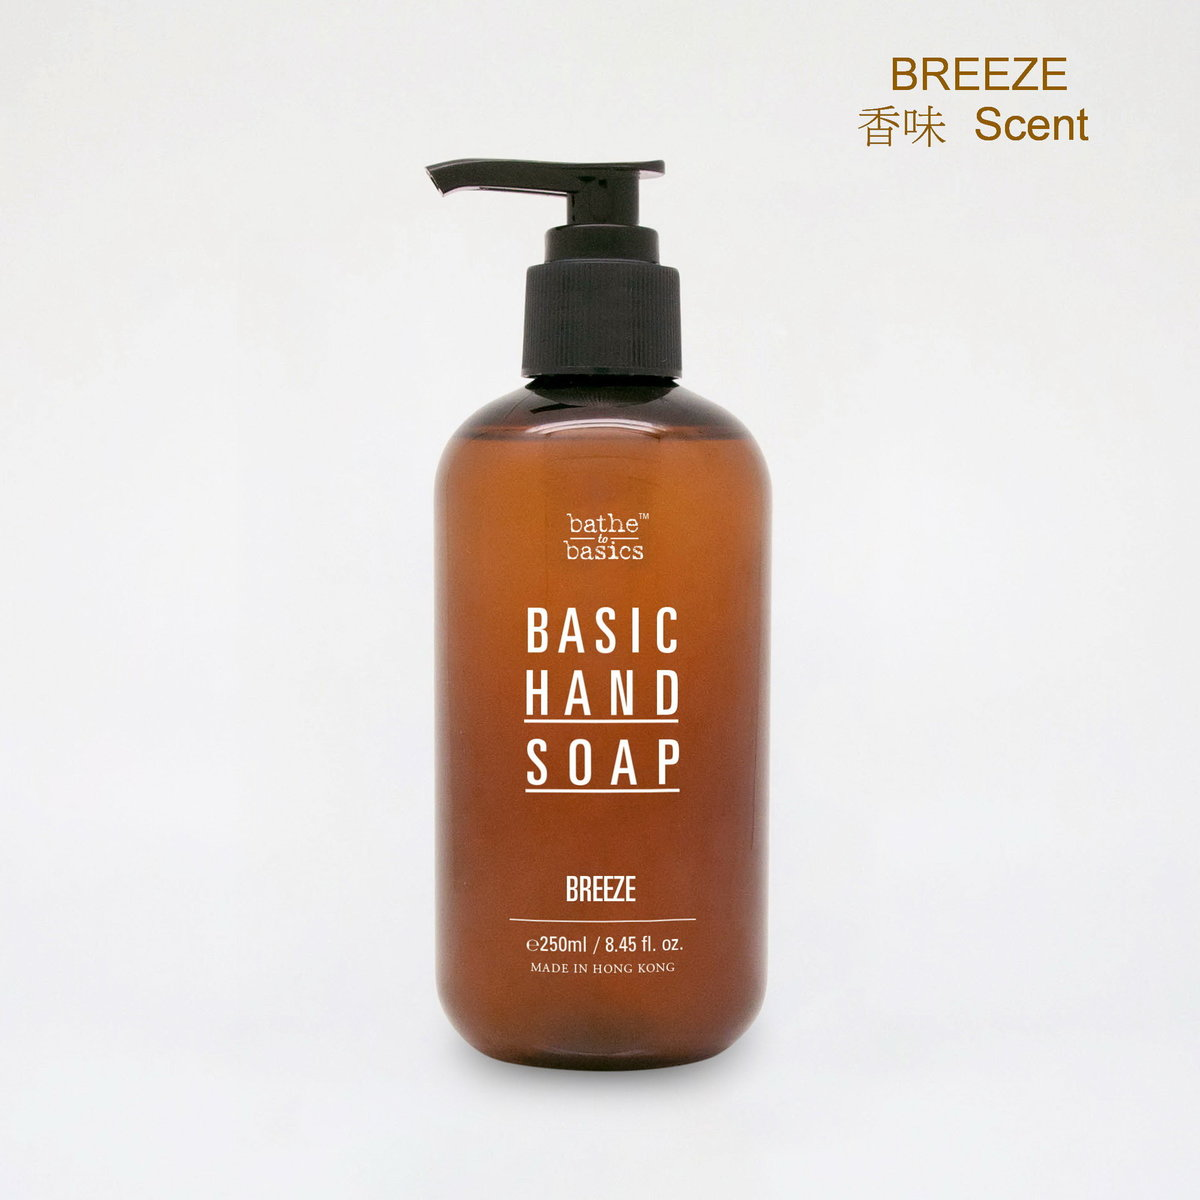 Bathe To Basics 天然保濕洗手液(Breeze-西柚洋甘菊茶樹香味) 250ml